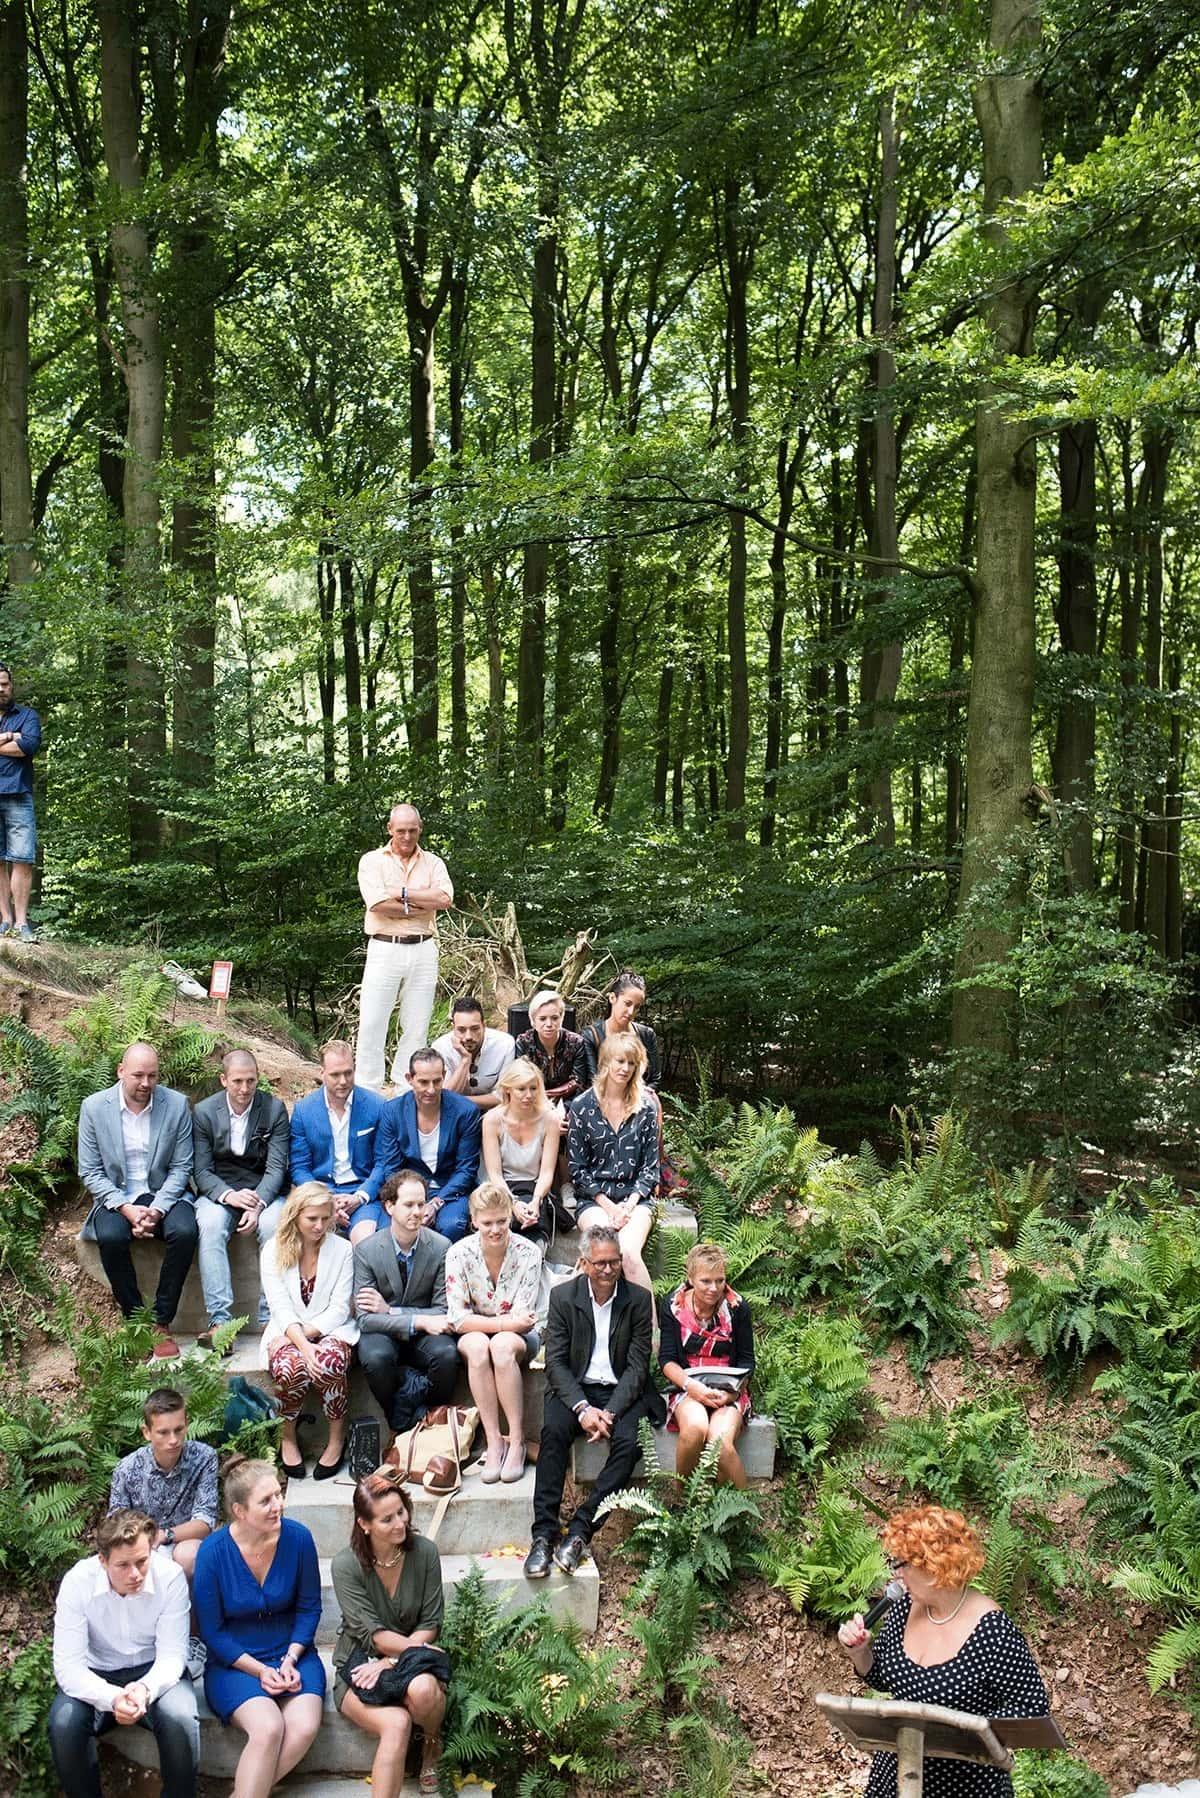 odizafotografie-bruidspaar-suzanne-en-stefanie-low-res-017